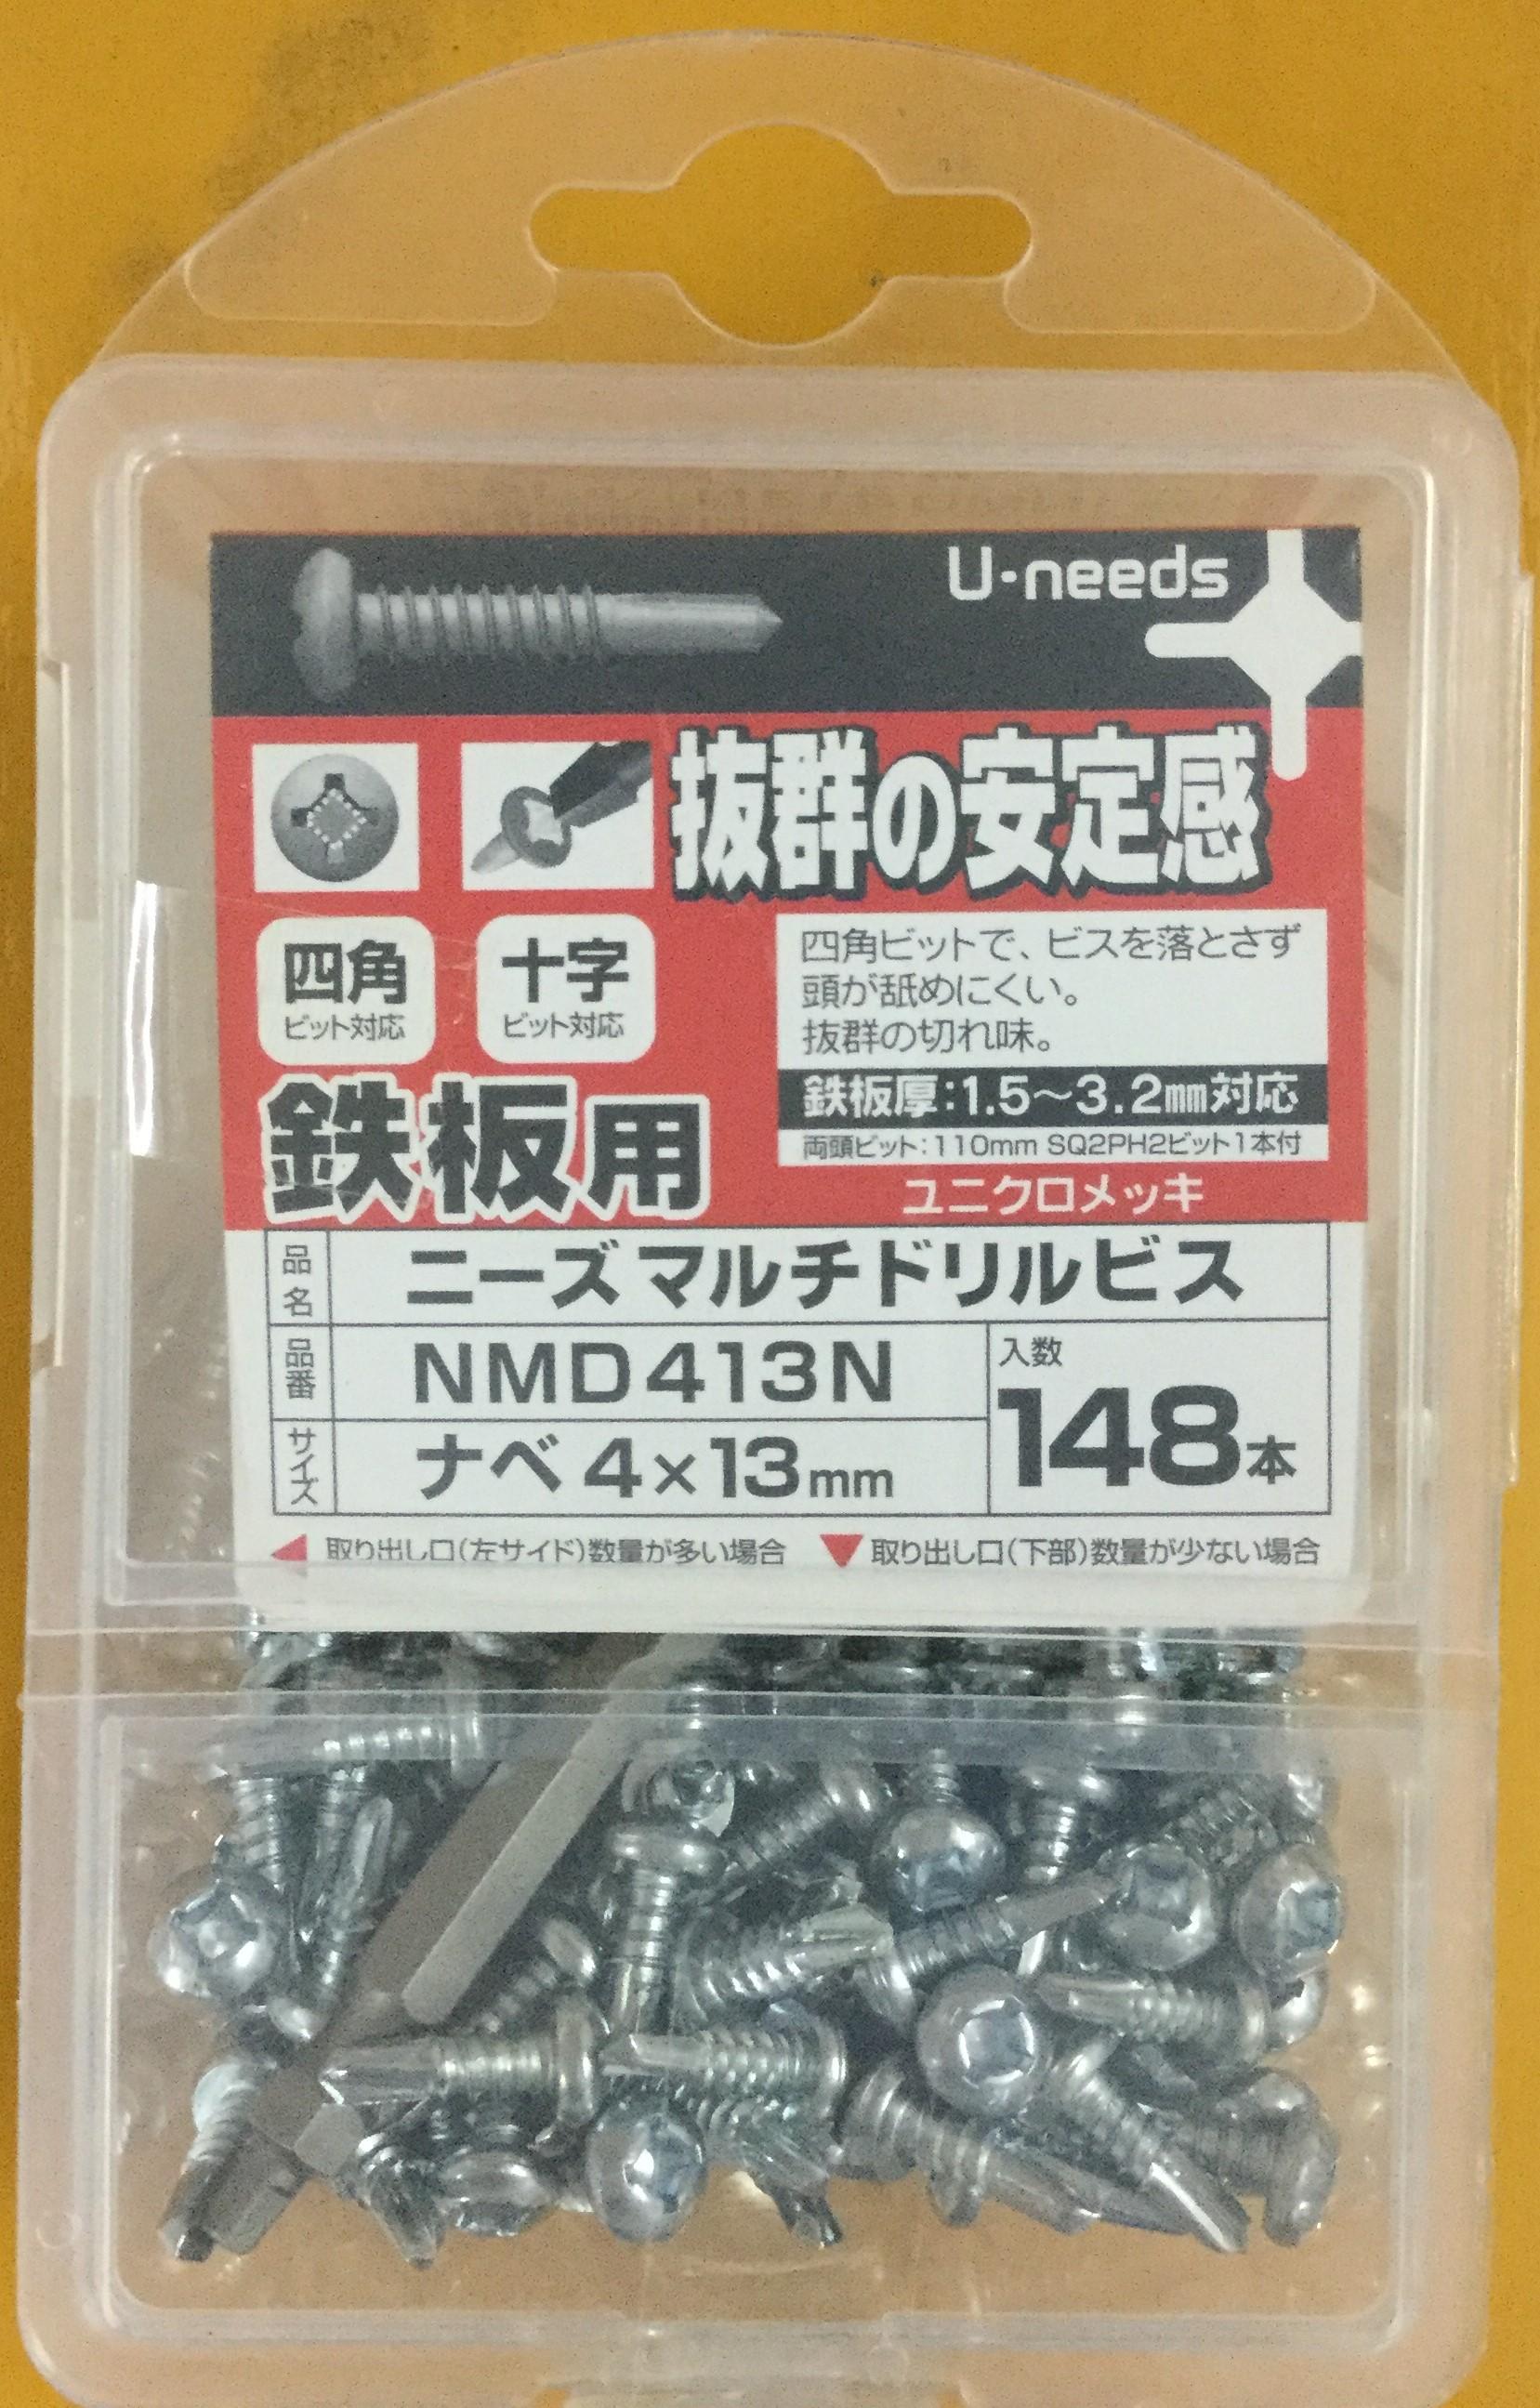 1.6mm~3.2mmまでの鉄板に 下穴なしで打ち込めるマルチドリルビス マルチドリルビスNMD413N プロ用 日本産 ニーズ2020 ユ 高級 オリジナル 鉄板ビス